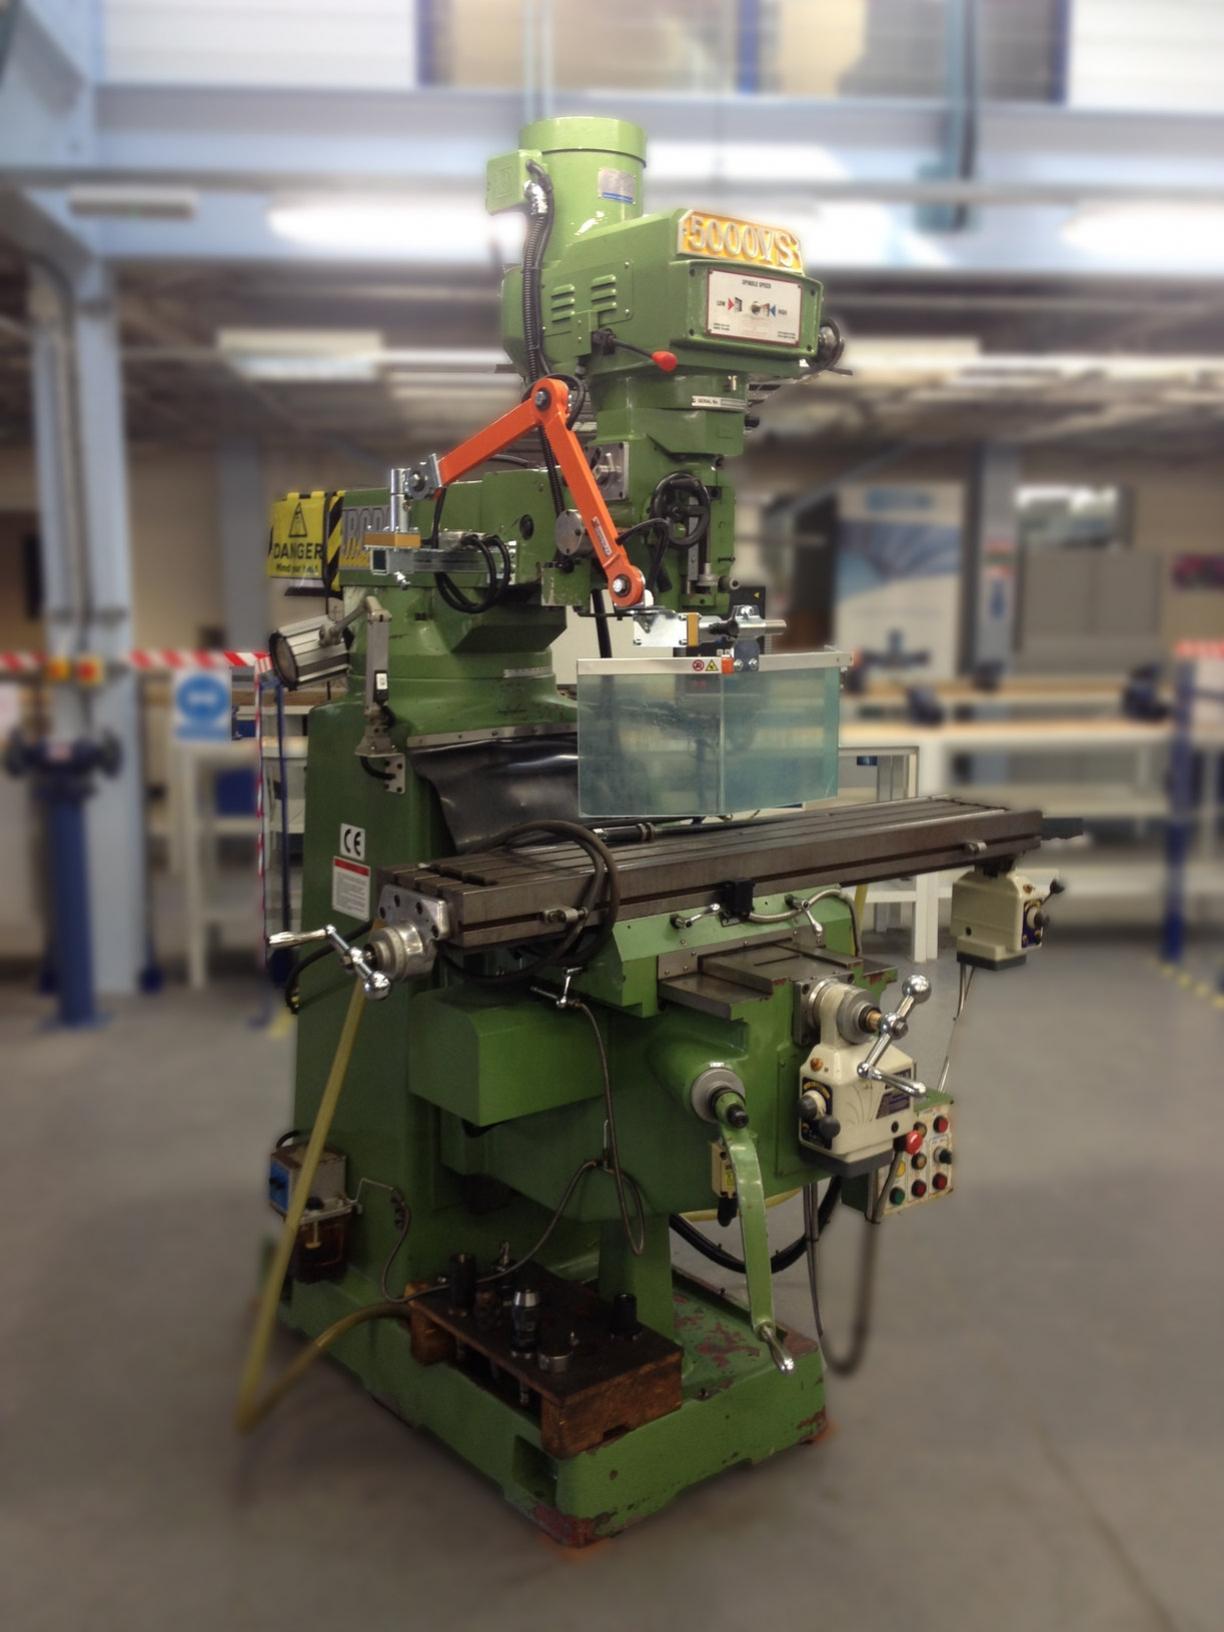 Drill Press Guard >> Machine Safety Guard for Universal Mills